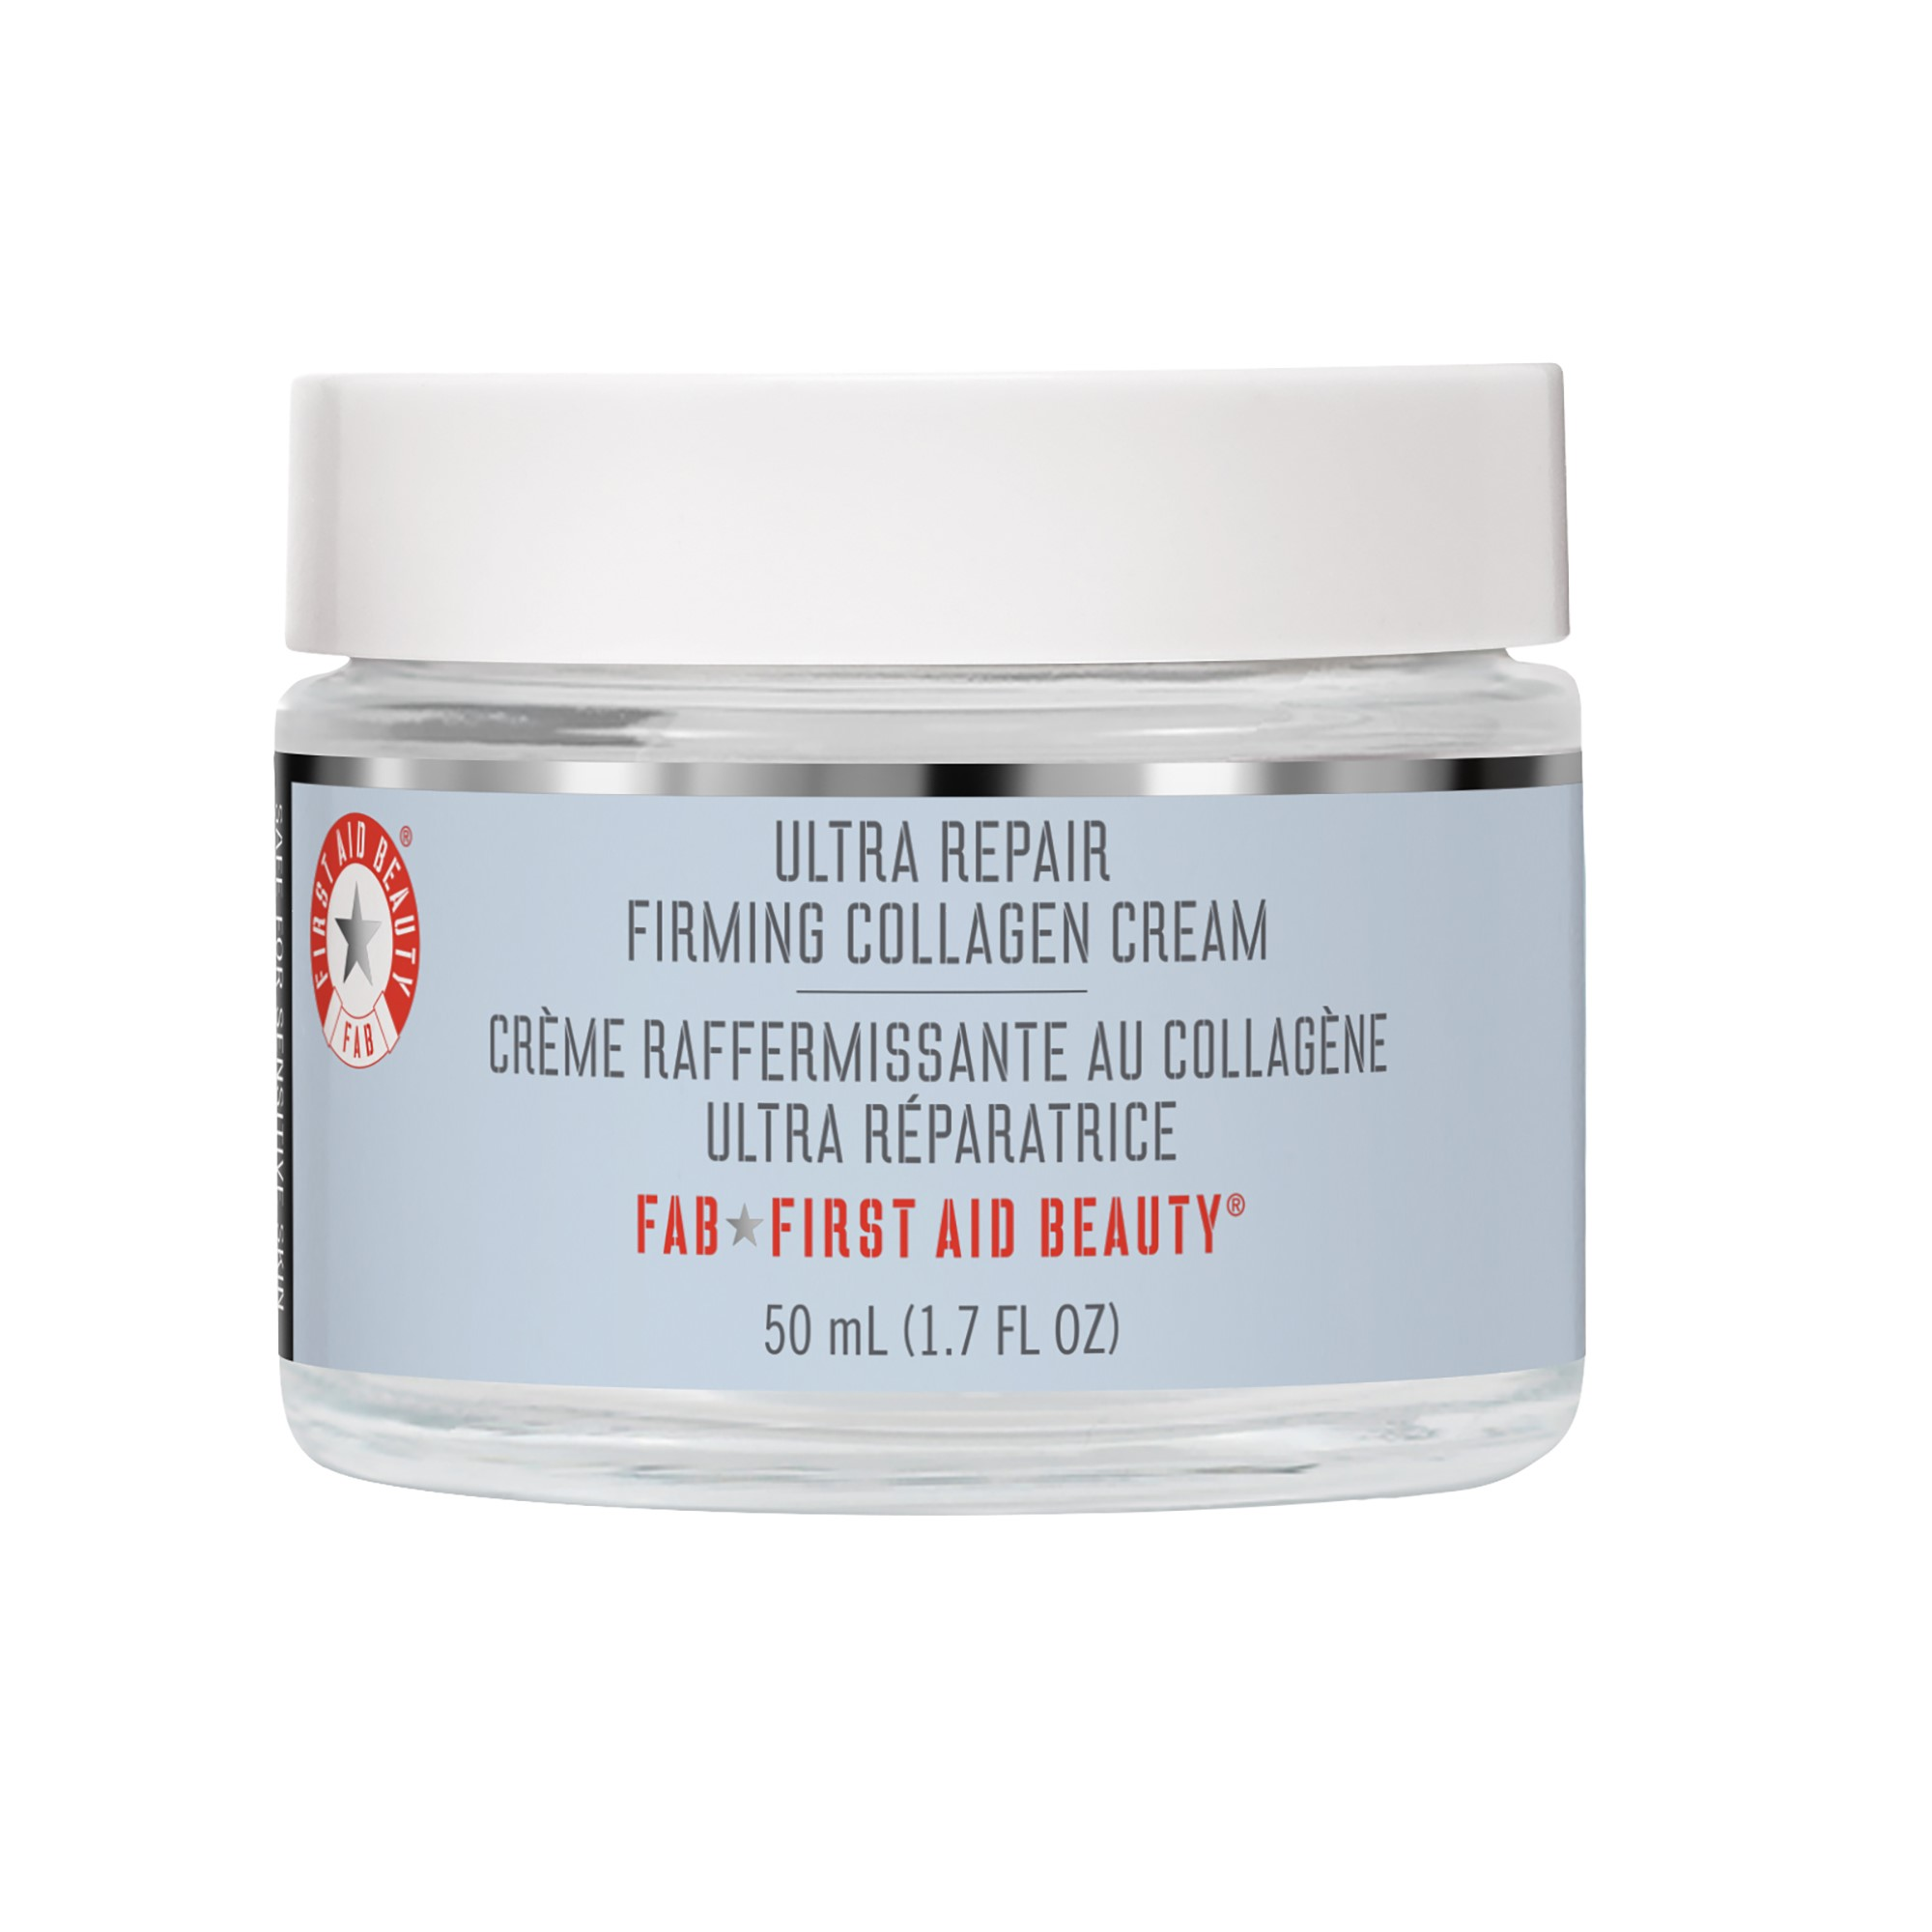 colageno, importancia de usar colageno, Ultra Repair firming Collagen cream